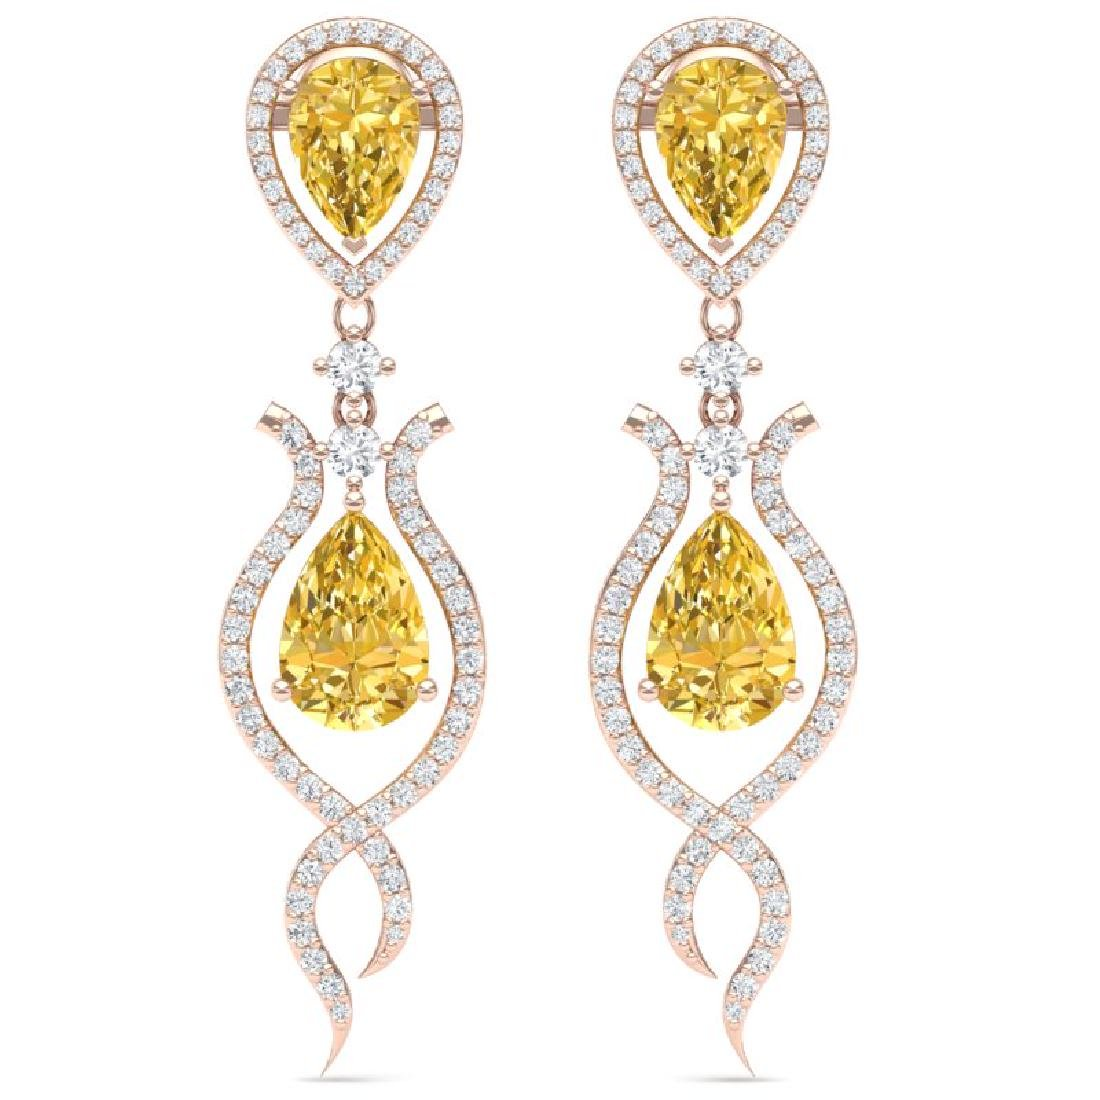 14.09 CTW Royalty Canary Citrine & VS Diamond Earrings